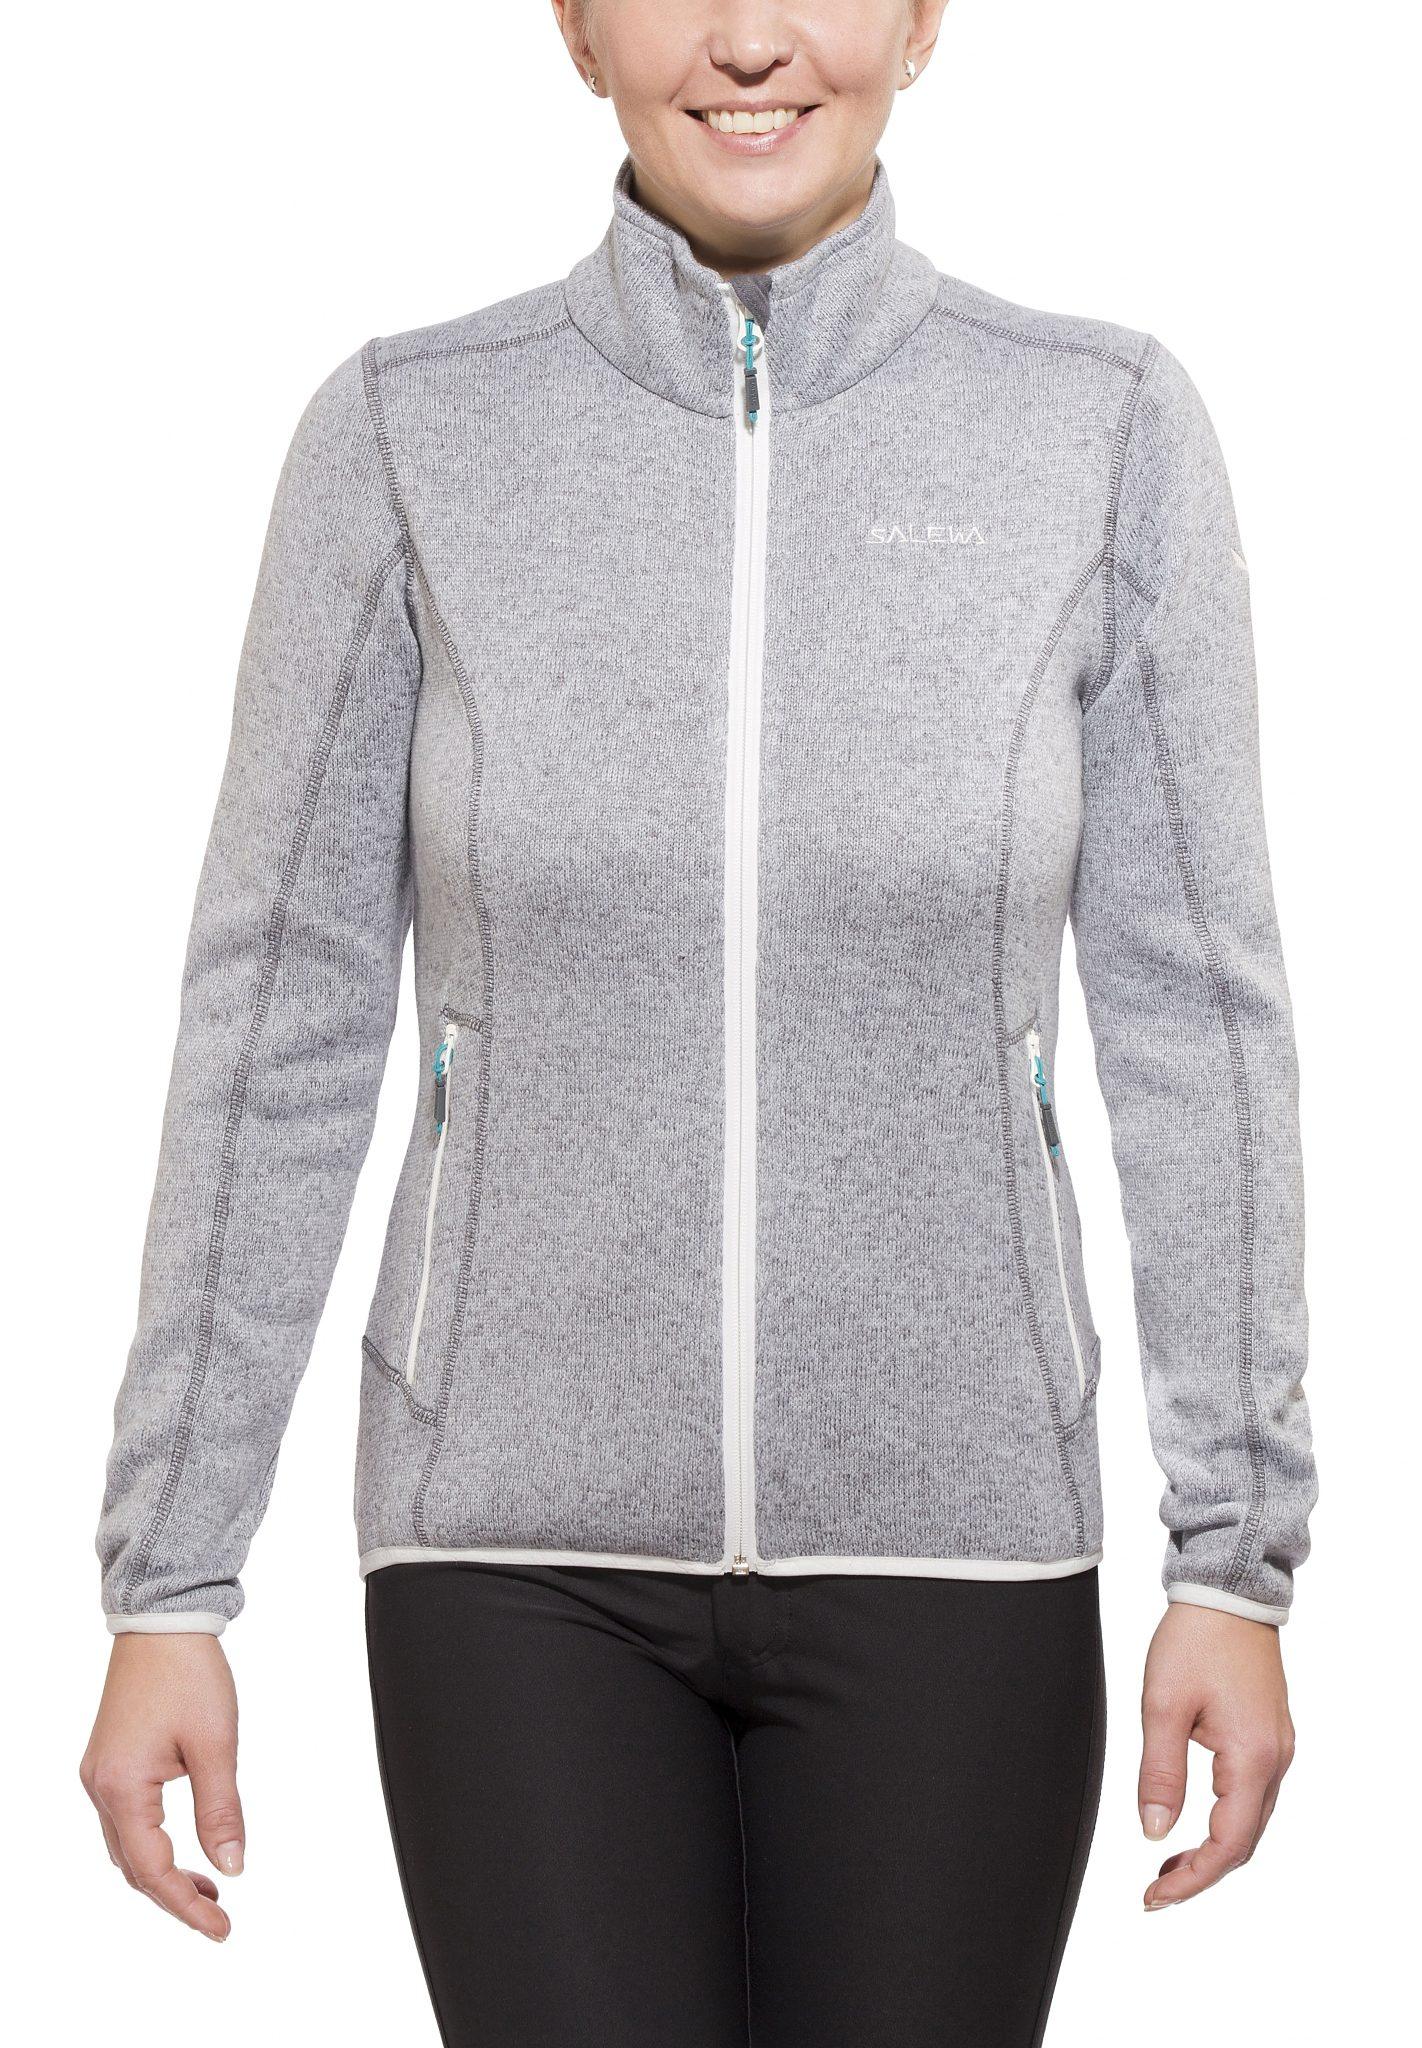 Salewa Outdoorjacke »Kitz 3 PL Jacket Women grey«